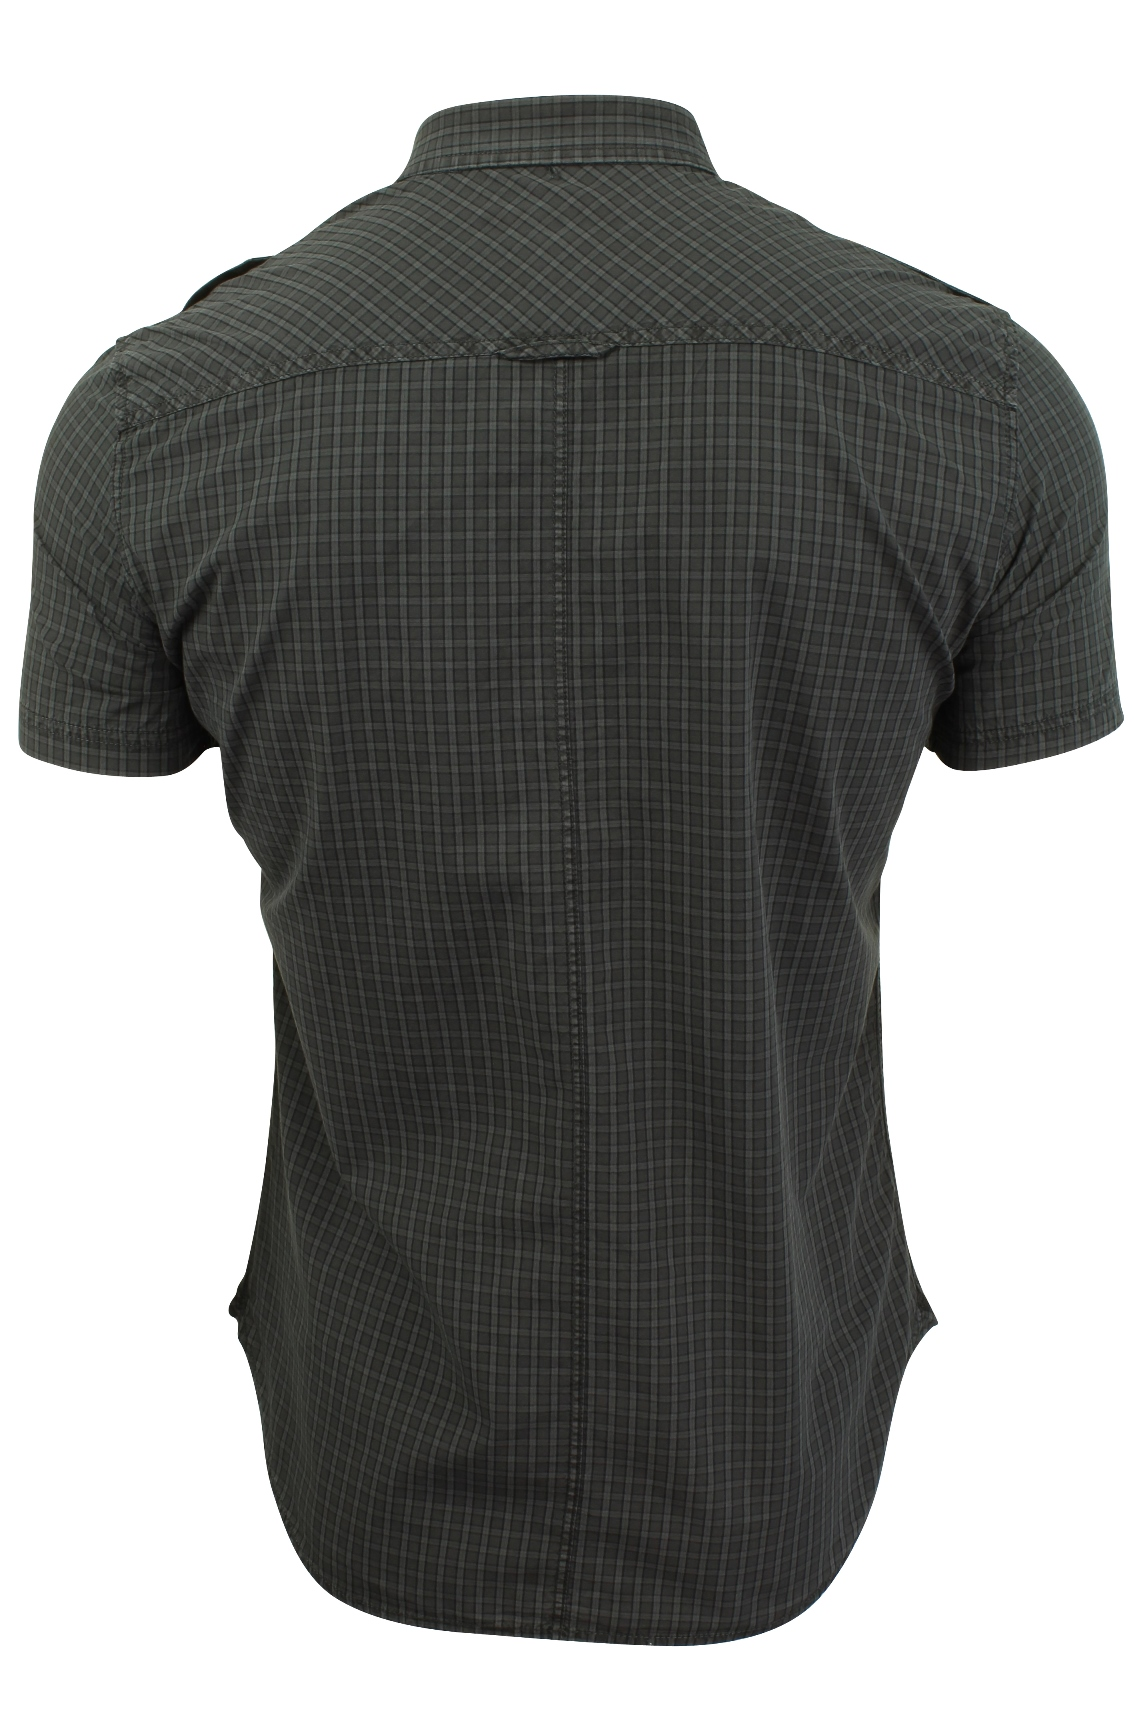 Mens-Short-Sleeved-Shirt-by-Firetrap thumbnail 29